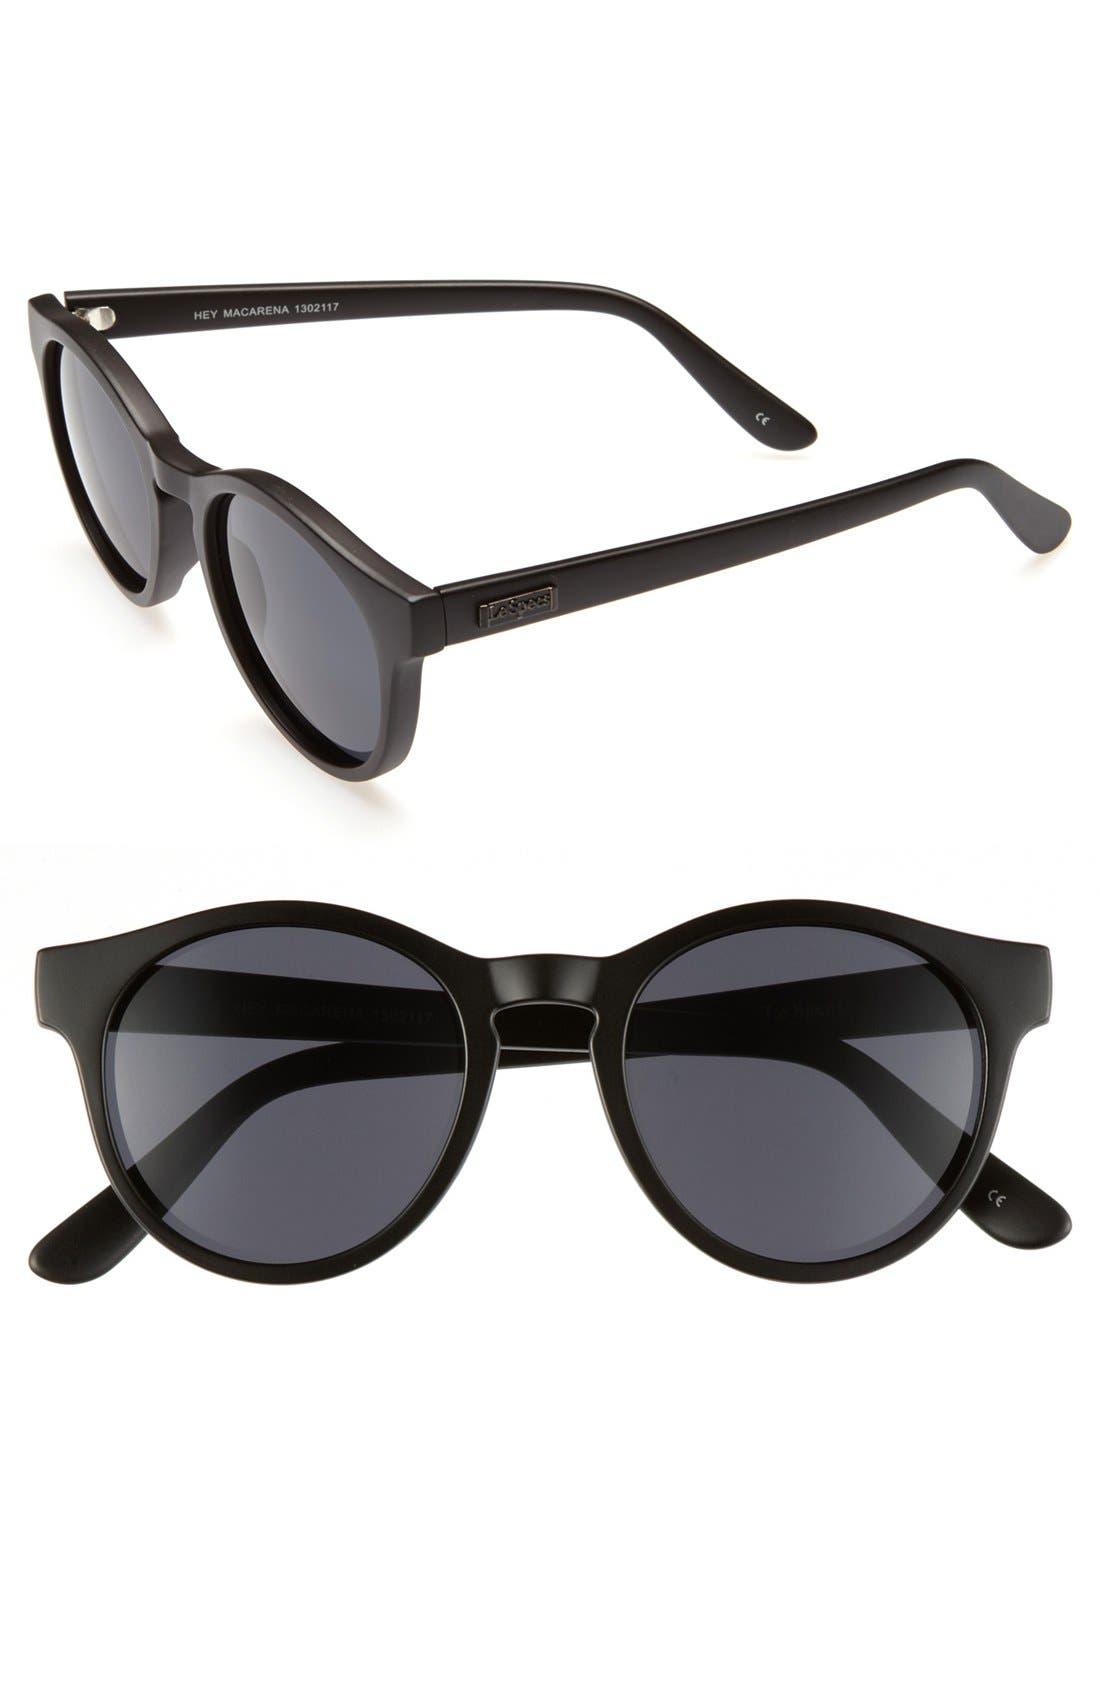 'Hey Macarena' Sunglasses,                             Main thumbnail 1, color,                             001